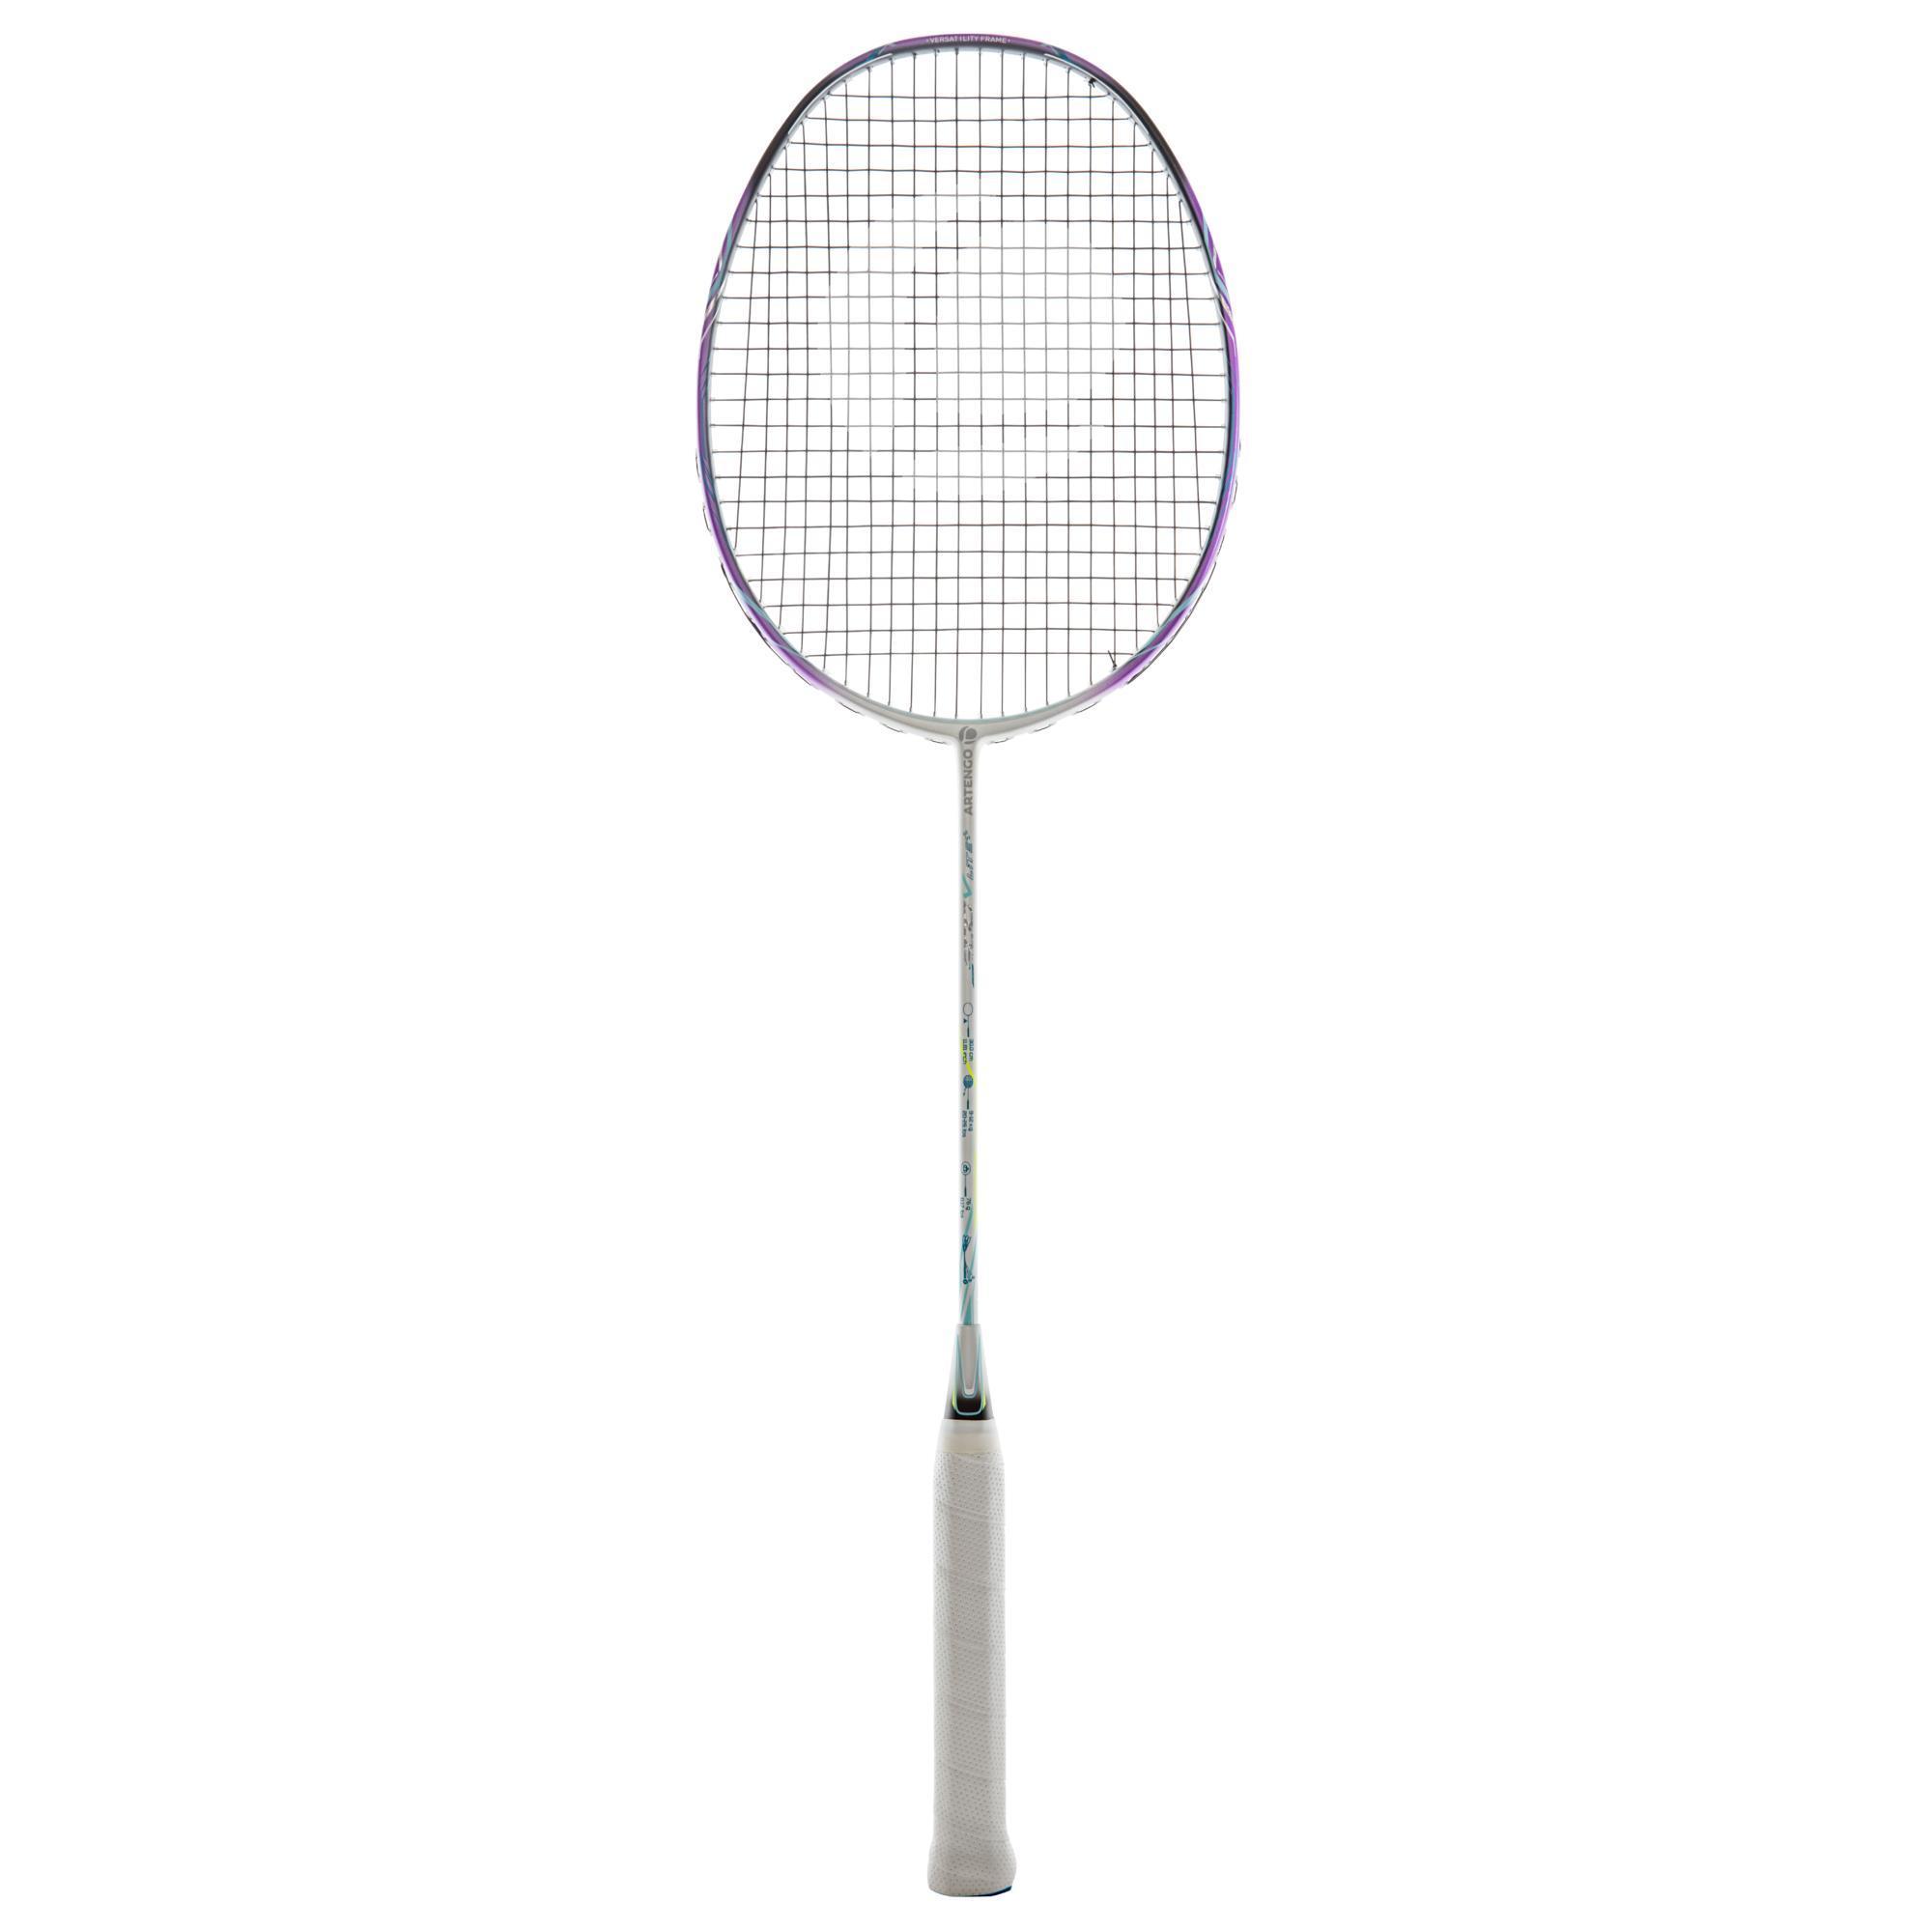 Perfly Badmintonracket volwassenen BR 900 Ultra Lite V paars kopen